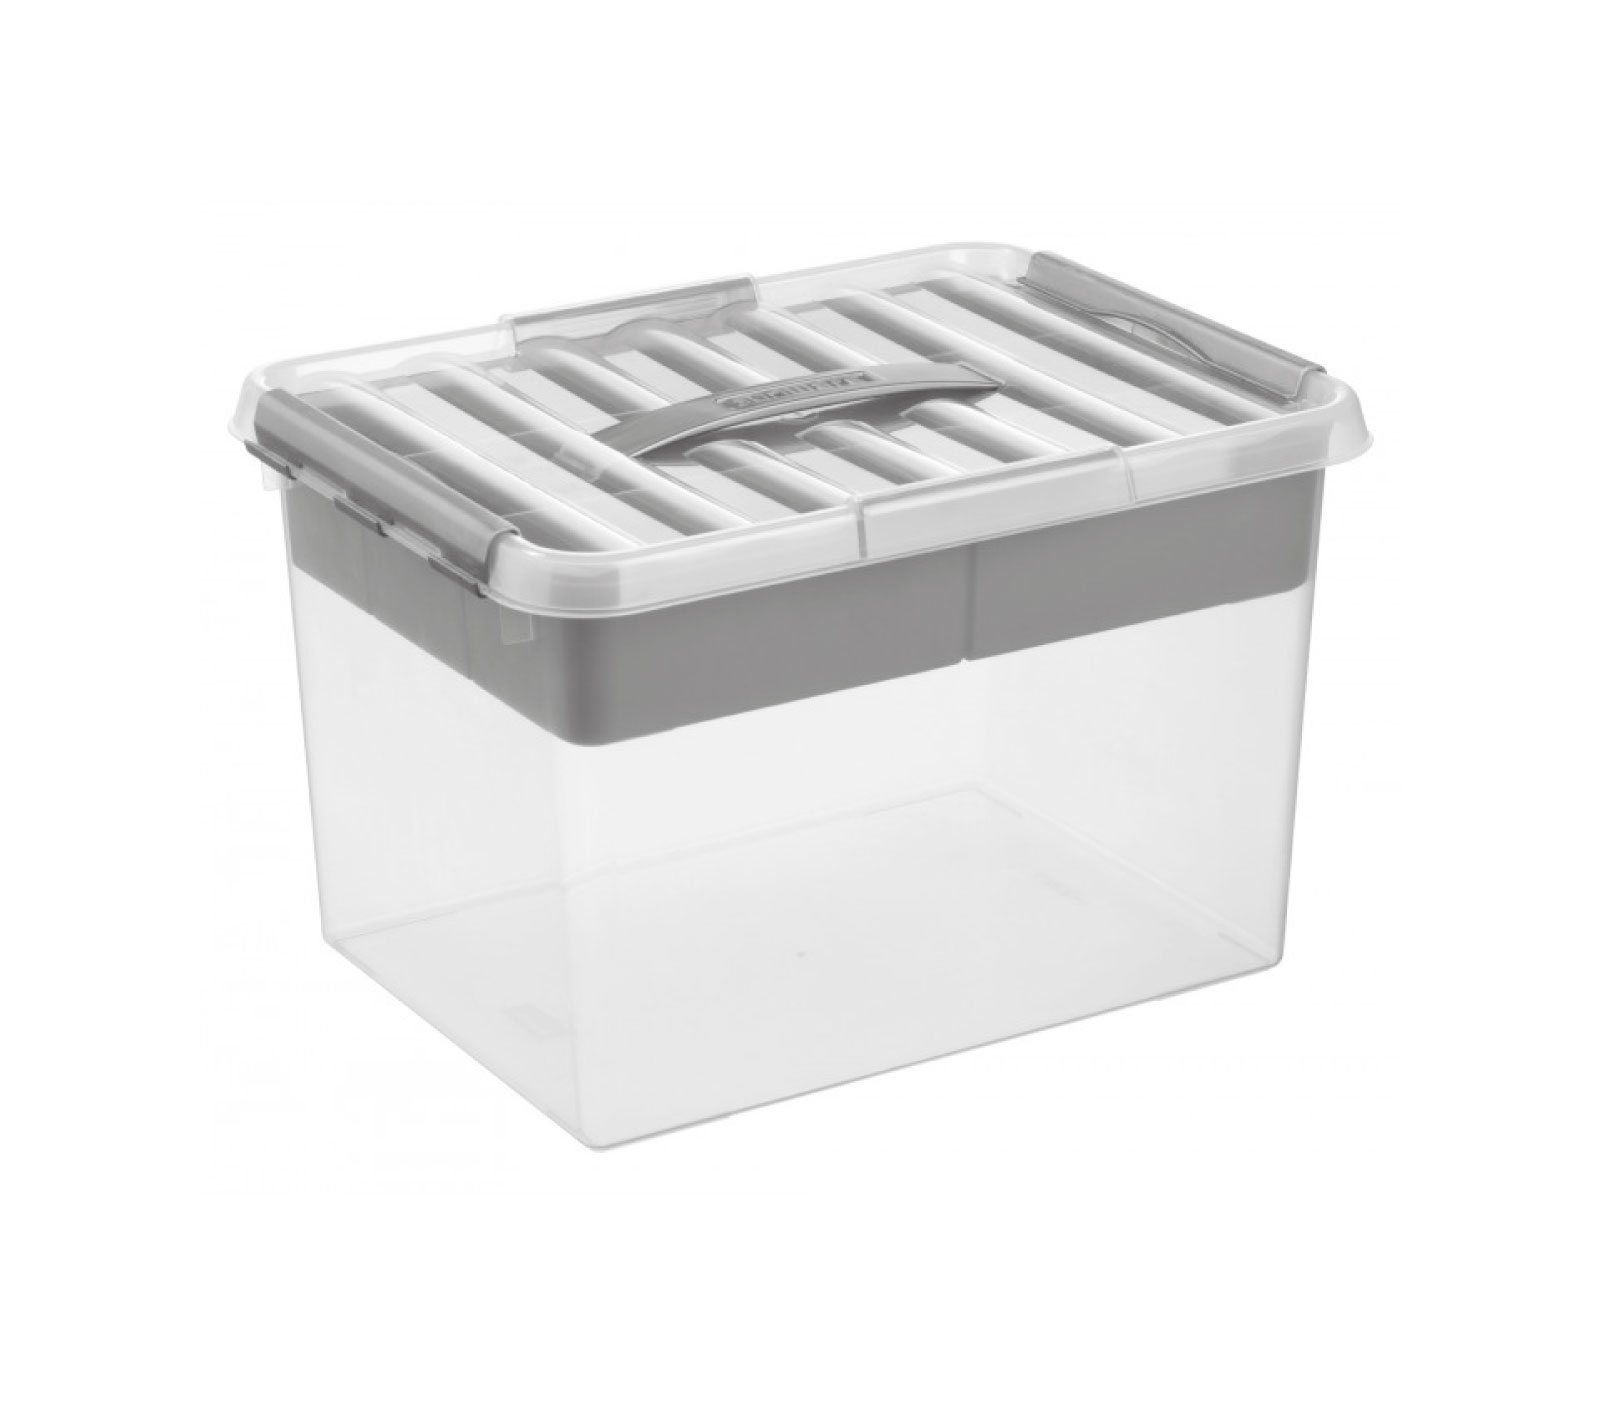 Sunware Q-line Multibox Large